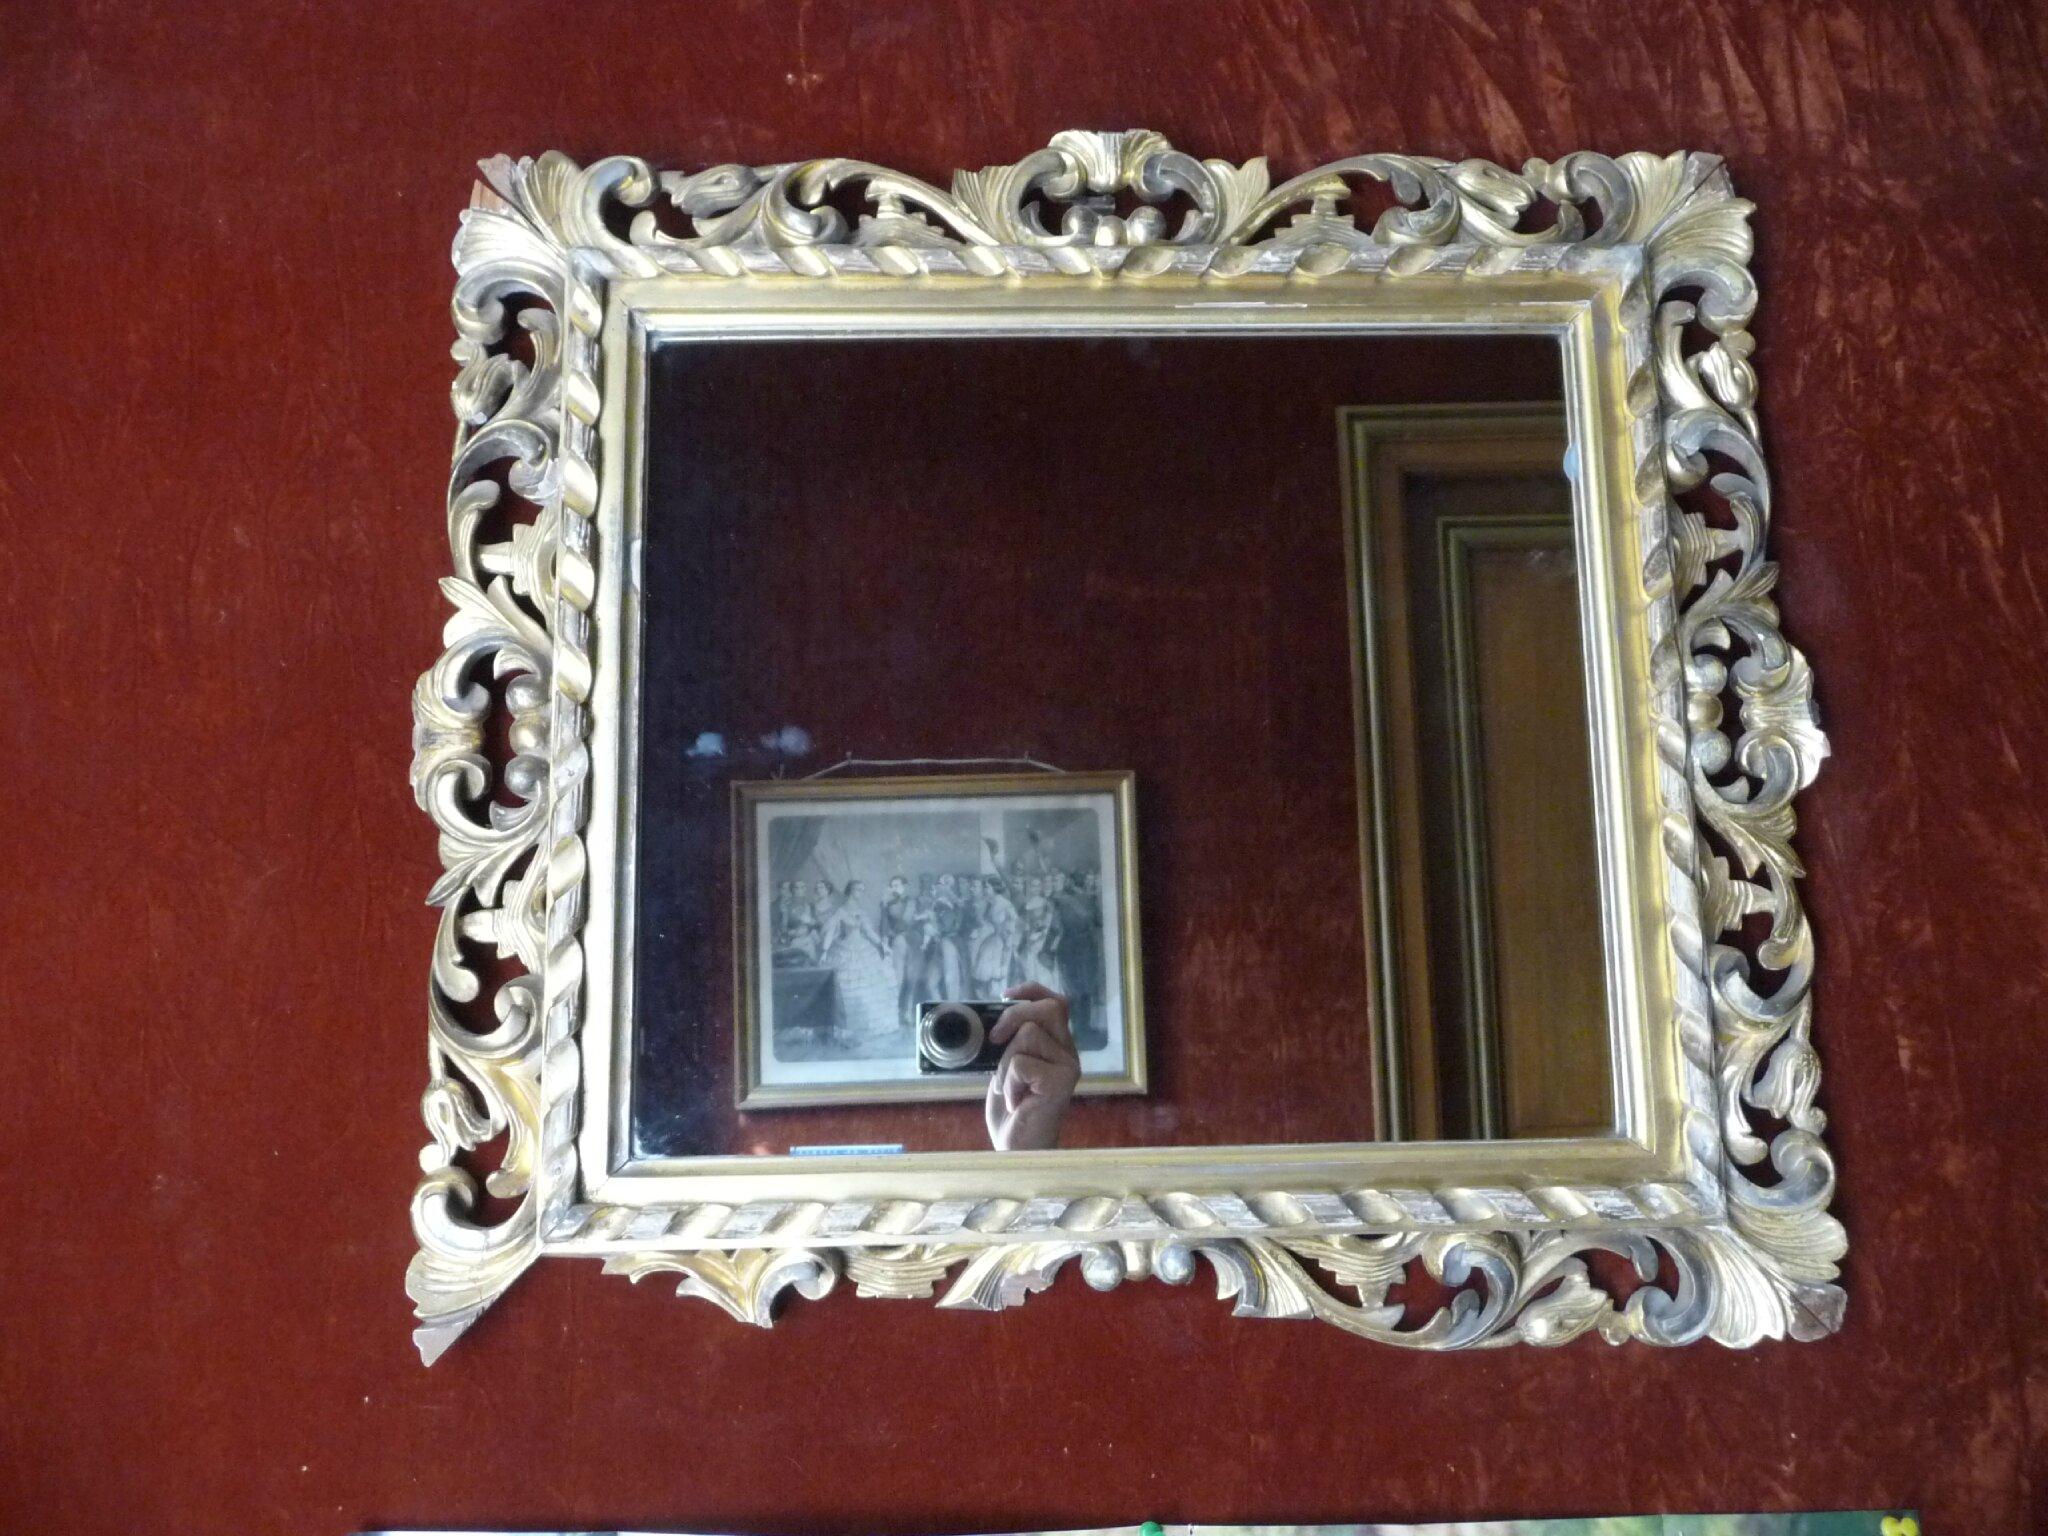 Miroir florentin de fabrication anglaise damien de laage for Fabrication de miroir